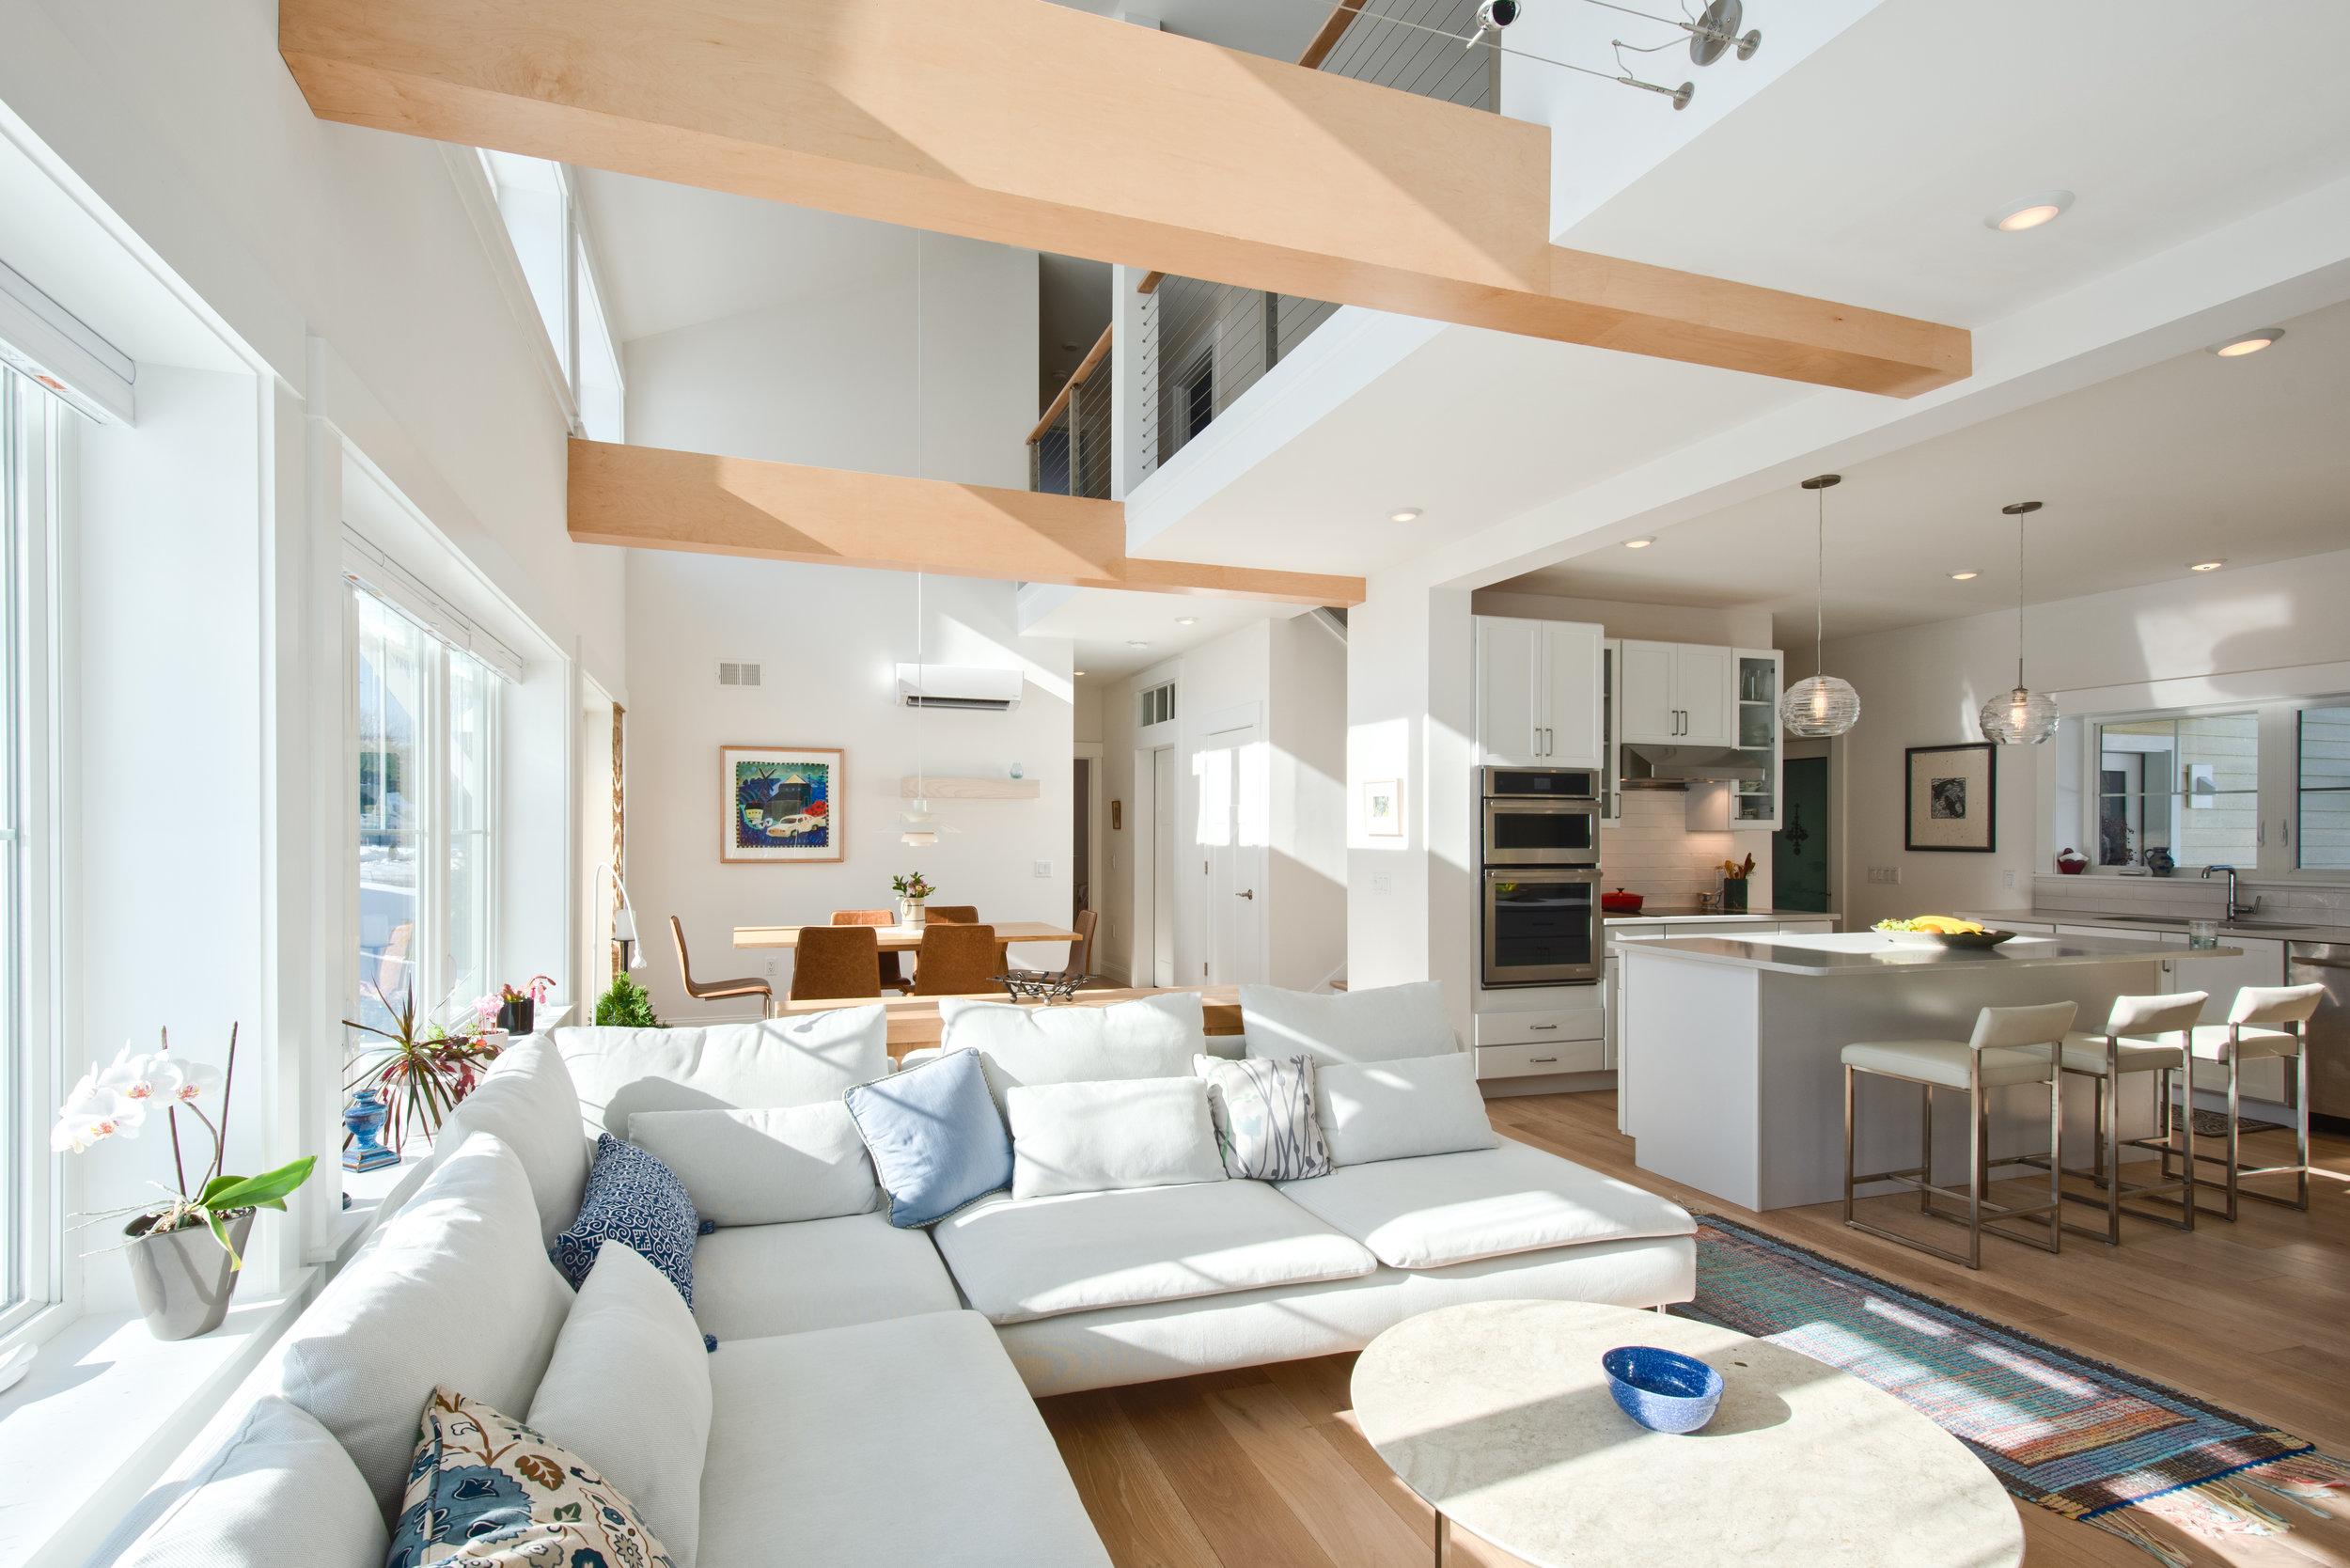 pre-fab-zero-energy-home-maine-brightbuilt-009.jpg